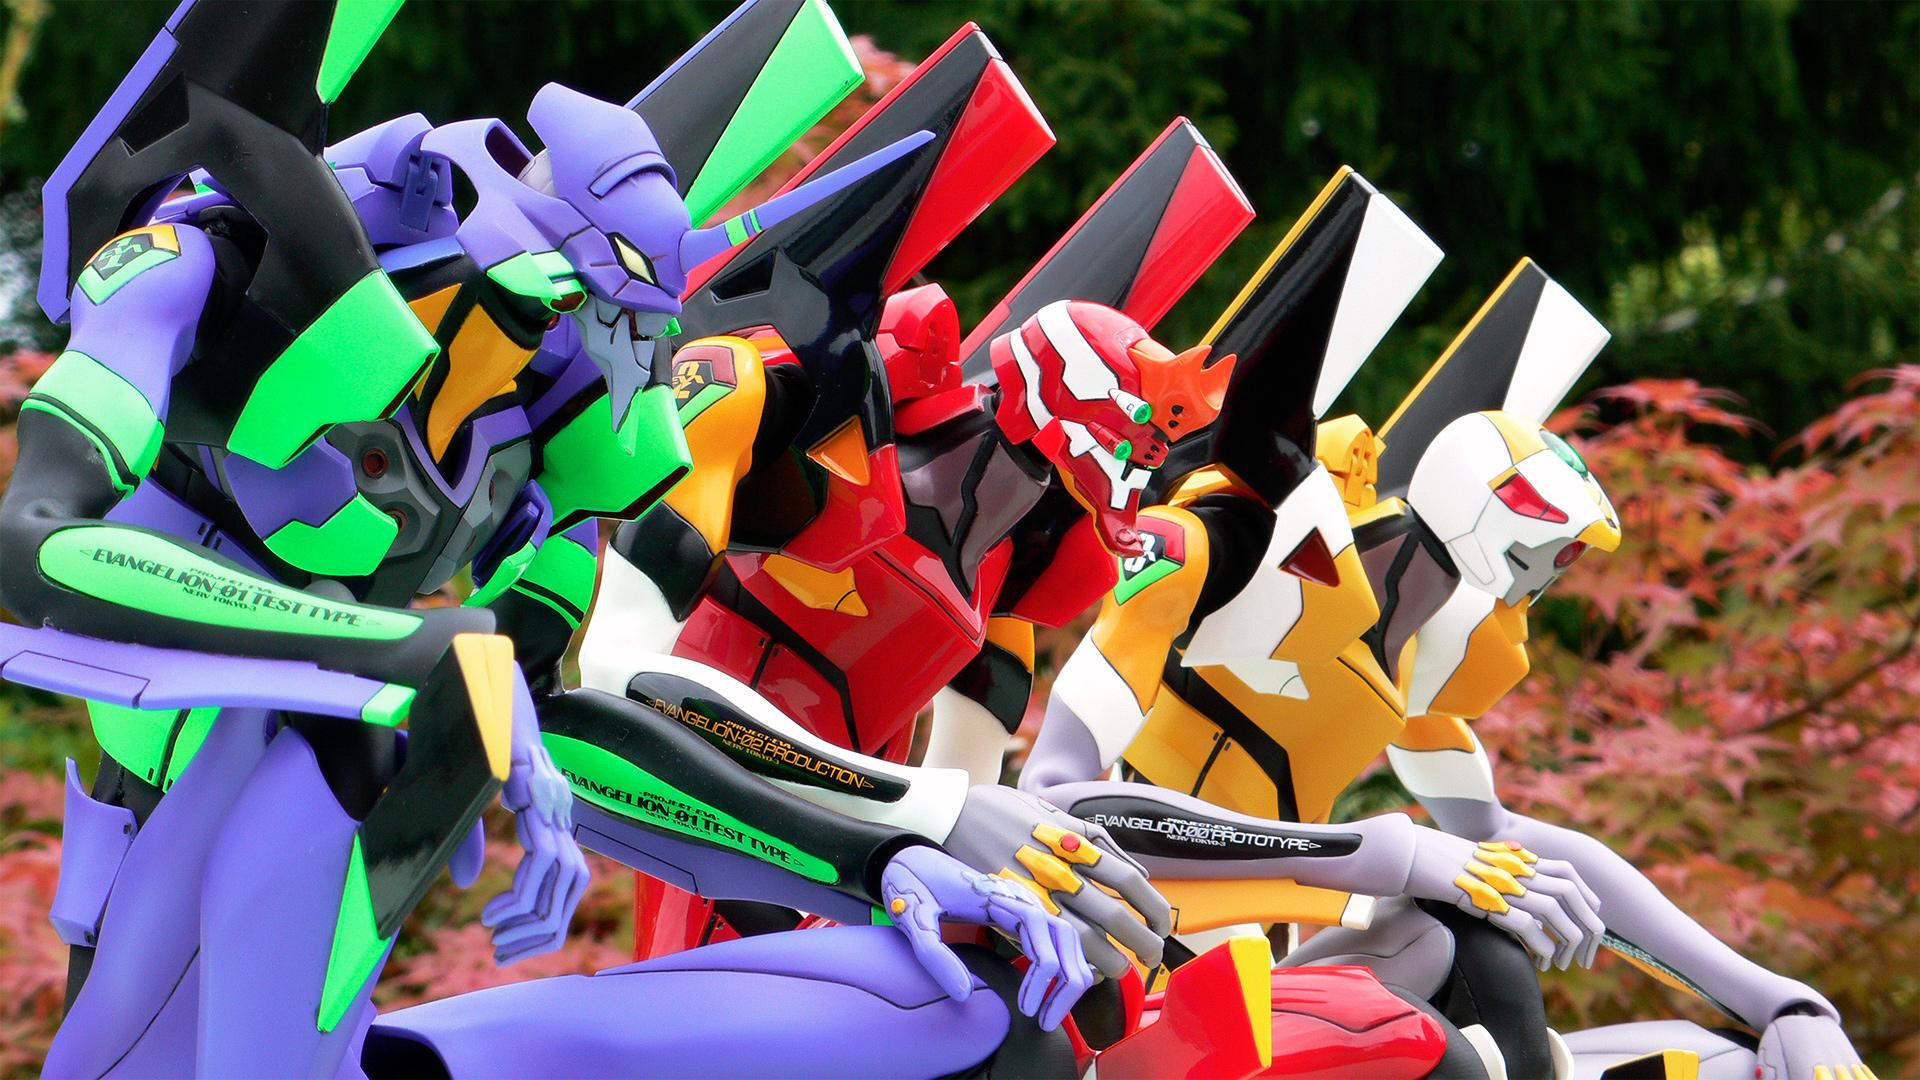 eva-01 eva-02 medicom_toy evangelion_shin_gekijouban eva-00 real_action_heroes perfect-studio evangelion_shin_gekijouban:_ha